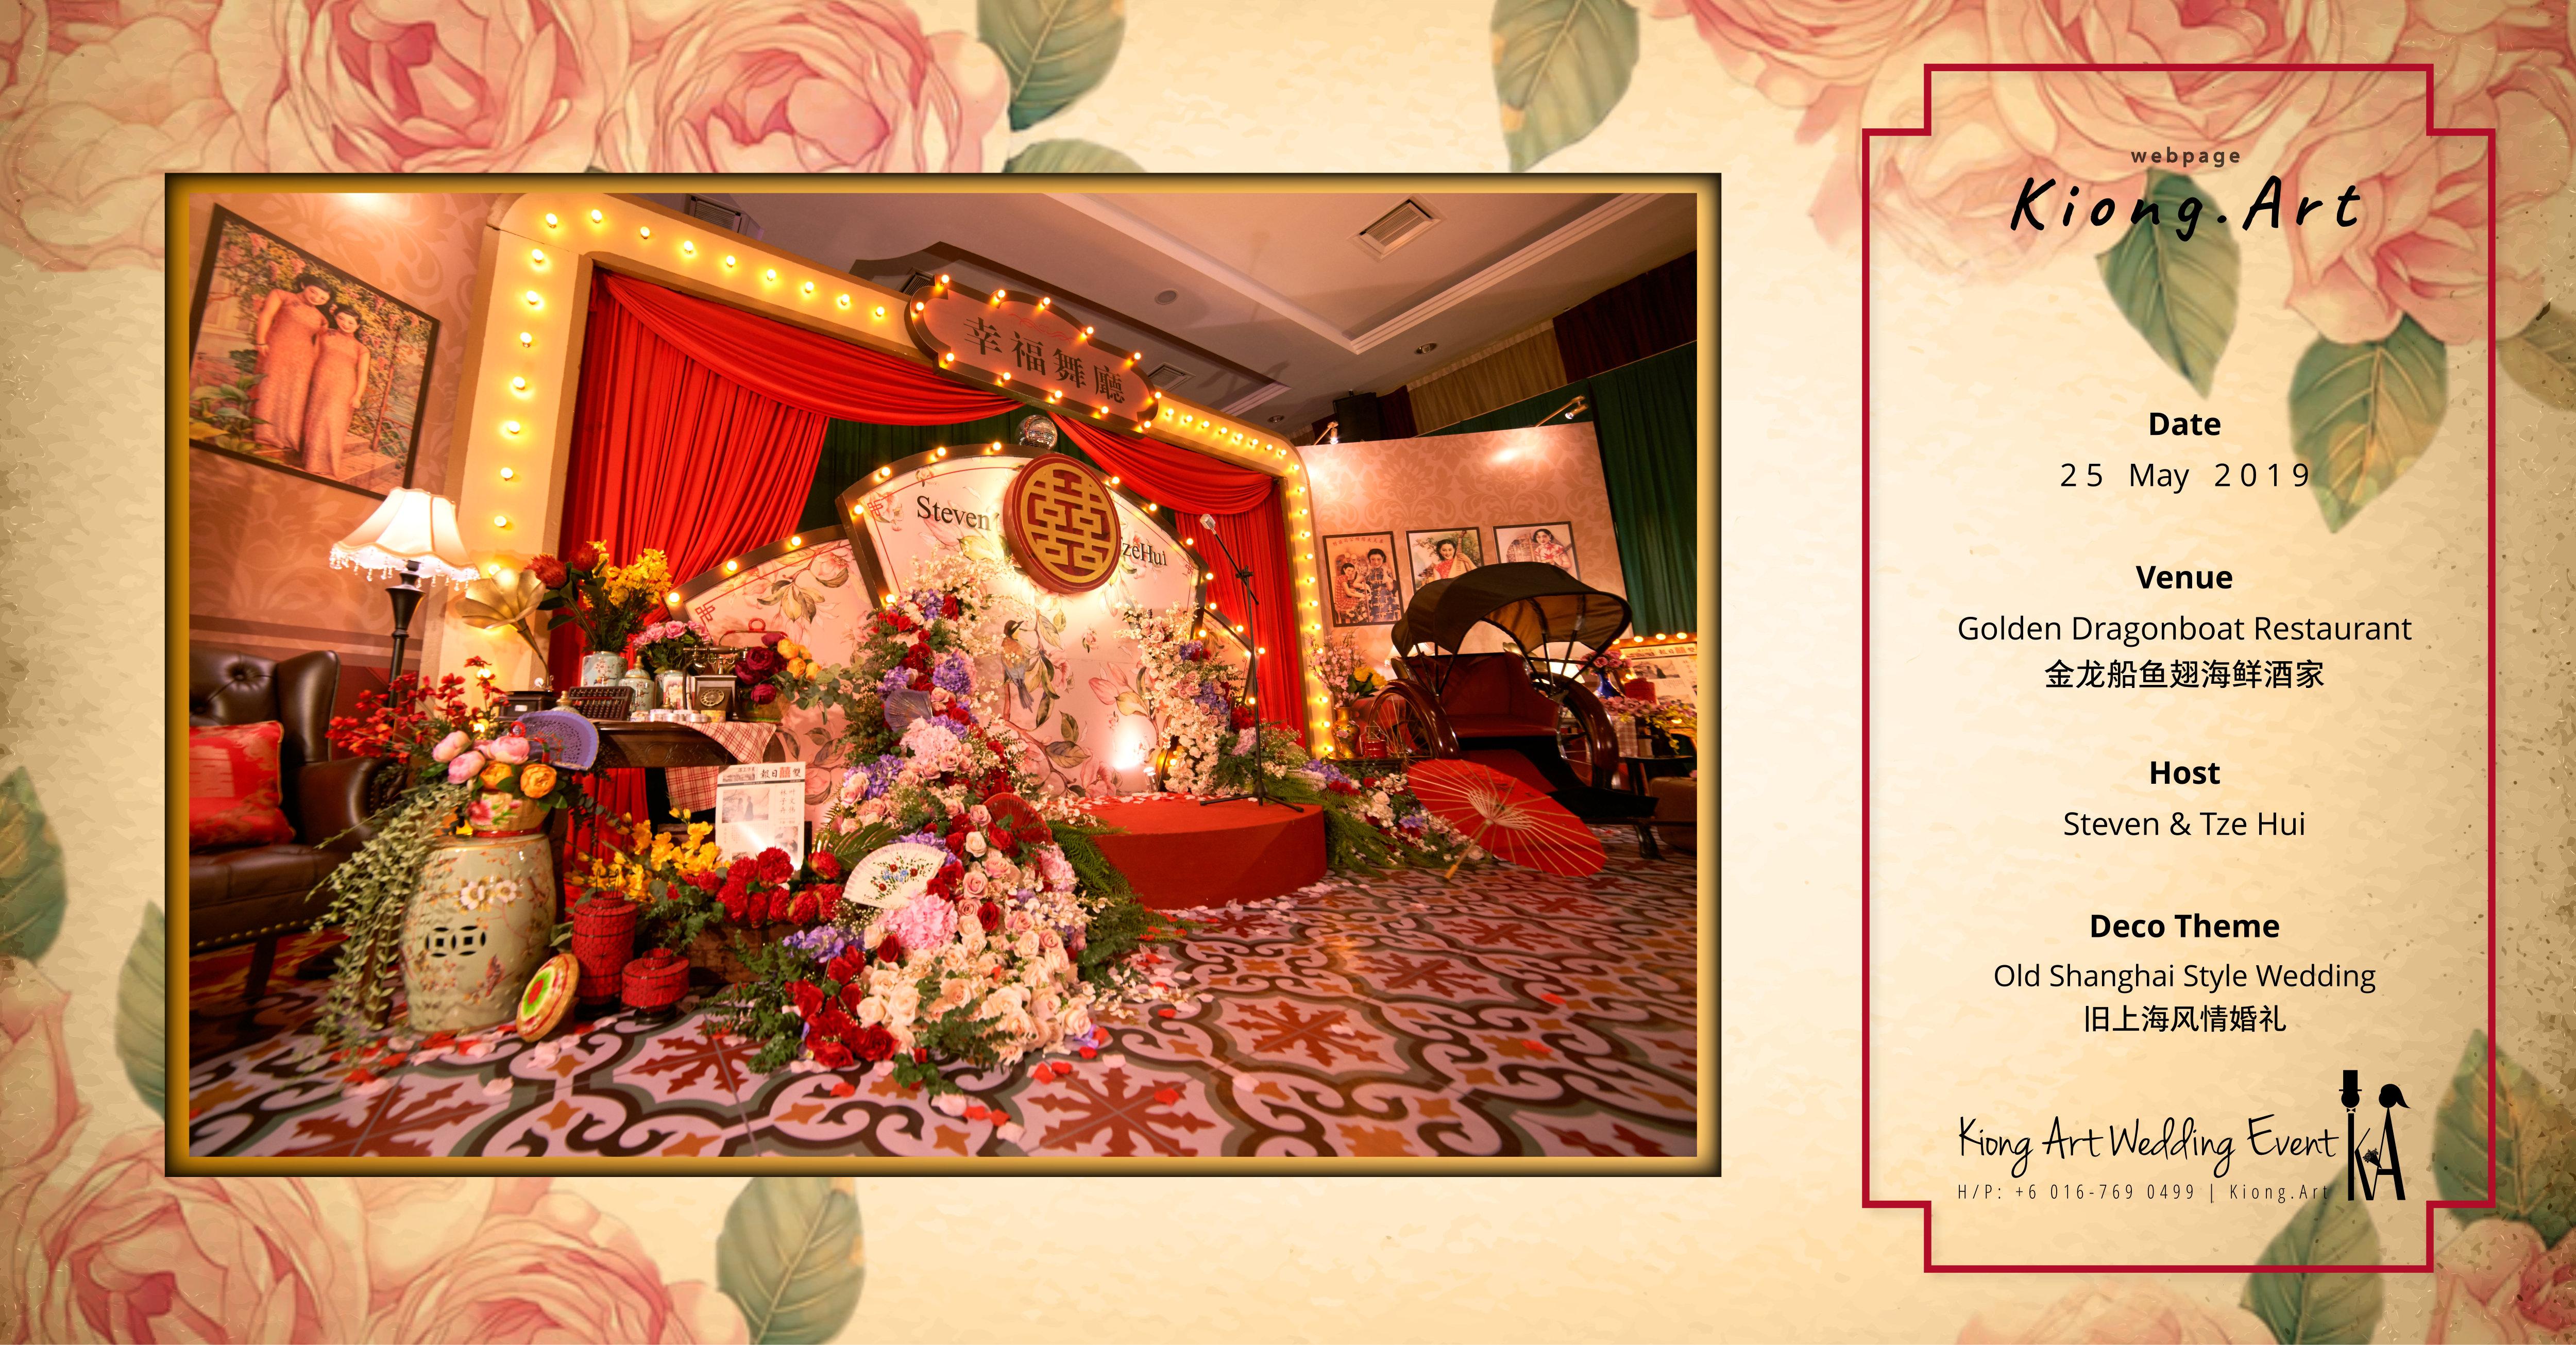 Kuala Lumpur Wedding Deco Decoration Kiong Art Wedding Deco Old Shanghai Style Wedding 旧上海风情婚礼 Steven and Tze Hui at Golden Dragonboat Restaurant 金龙船鱼翅海鲜酒家 Malaysia A16-B00-010